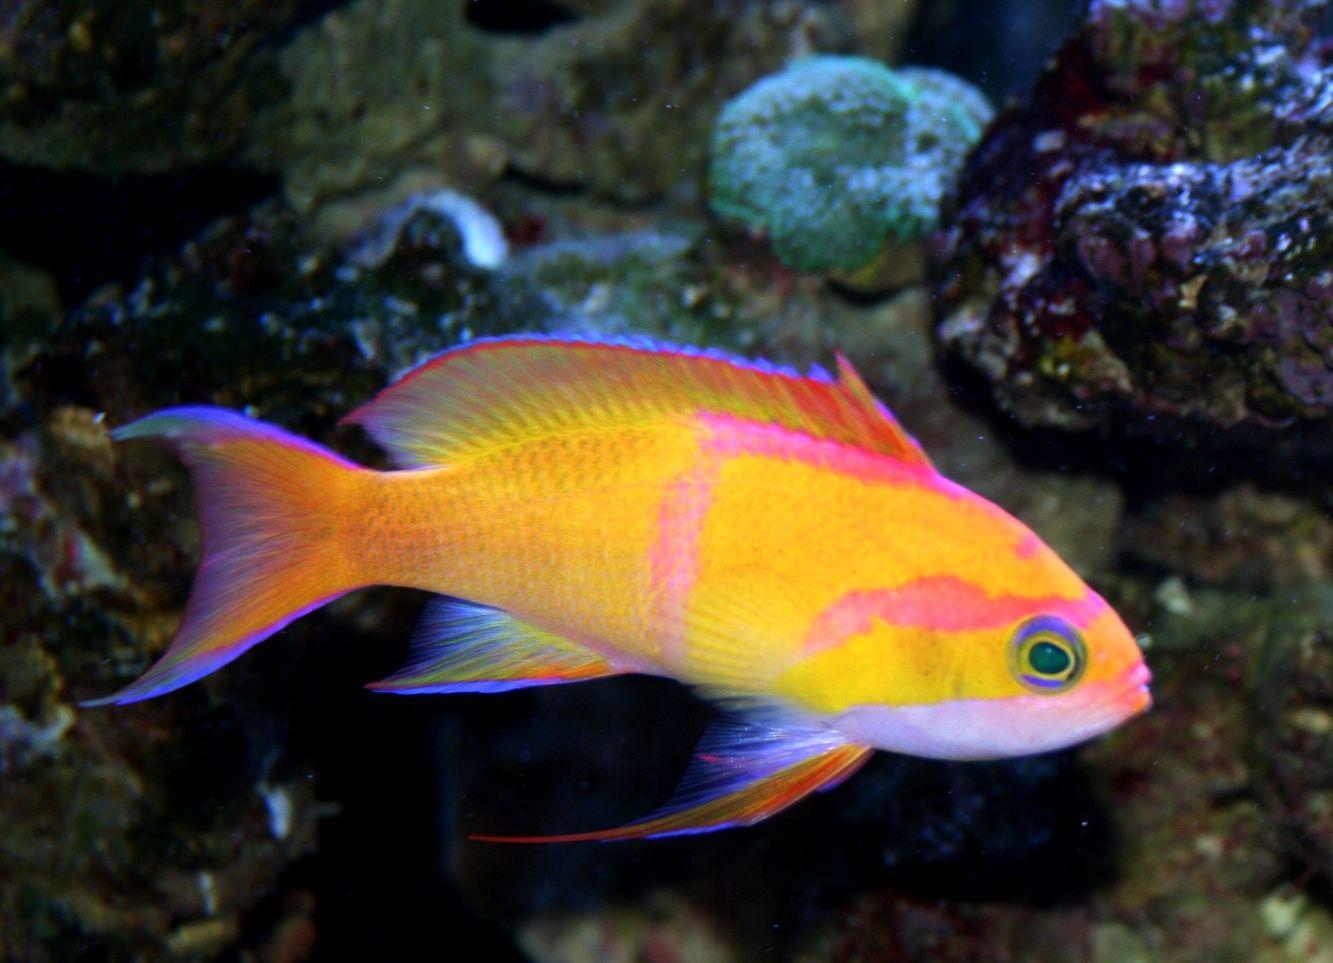 Rare Tropical Saltwater Fish The rare Anthias saltw...